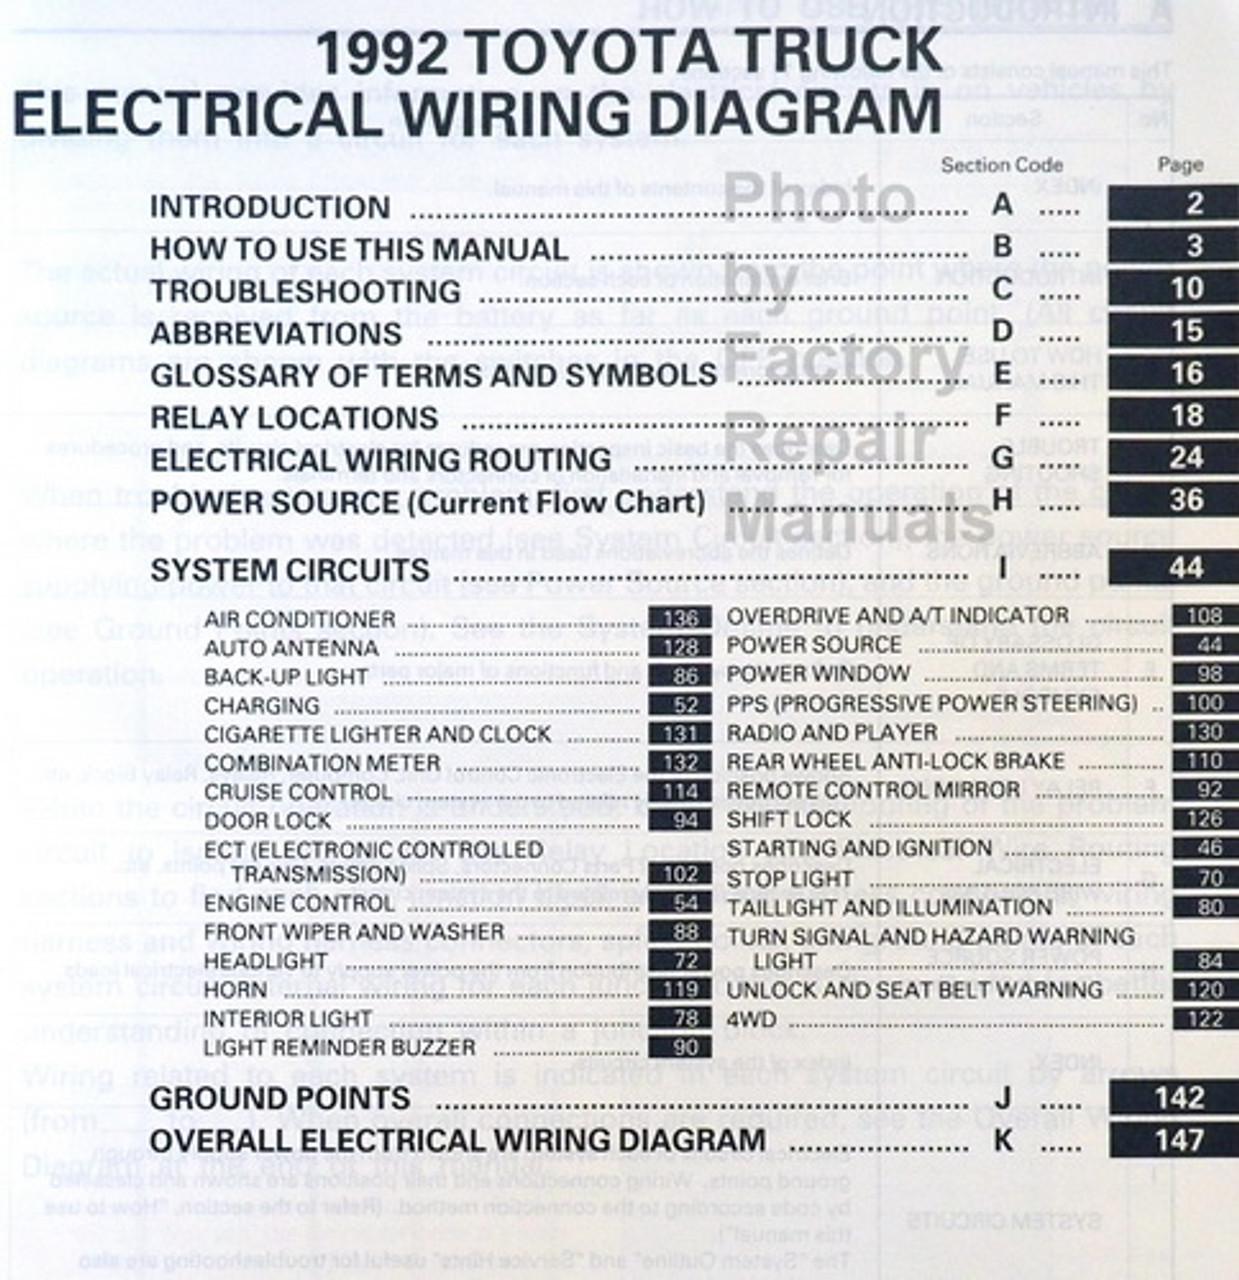 [XOTG_4463]  1992 Toyota Pickup Truck Electrical Wiring Diagrams Original - Factory  Repair Manuals | 1992 Toyota Tercel Wiring Diagram |  | Factory Repair Manuals